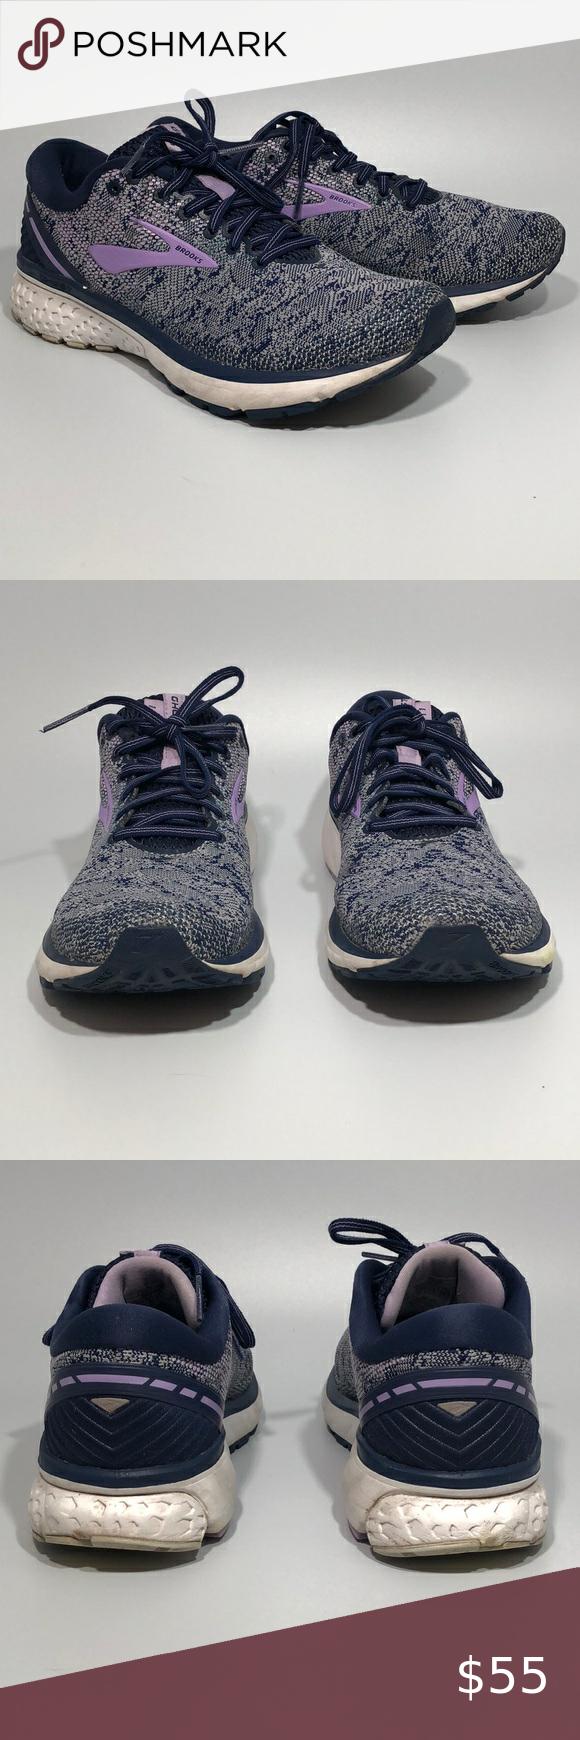 BROOKS GHOST 11 Women's Running, size 9